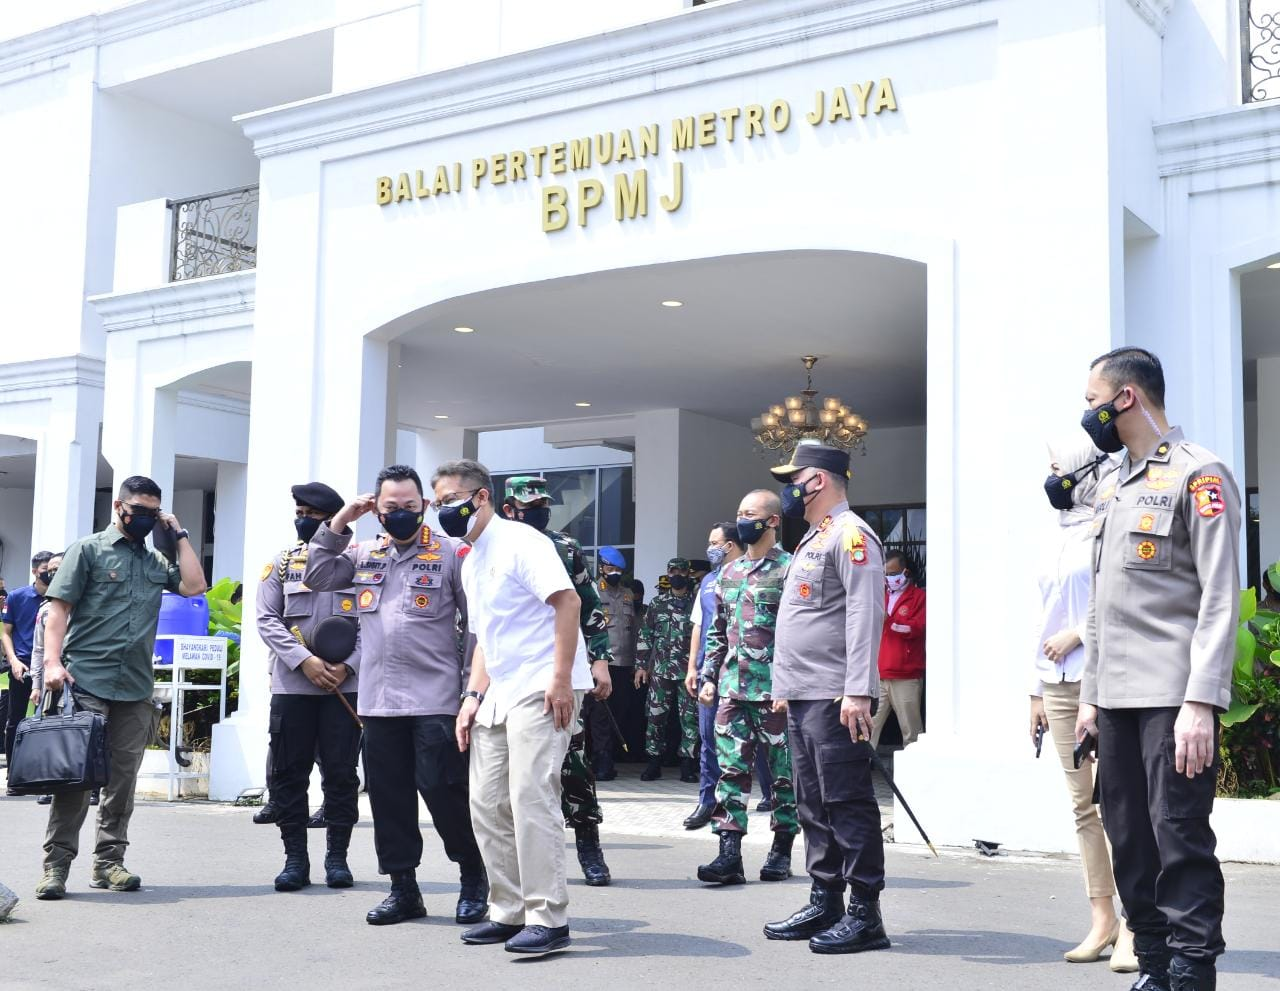 Kapolri Jenderal Pol Listyo Sigit Prabowo bersama Kapolda Metro Jaya Irjen Pol M Fadil Imran di Mapolda Metro Jaya. (Foto: PMJ News).